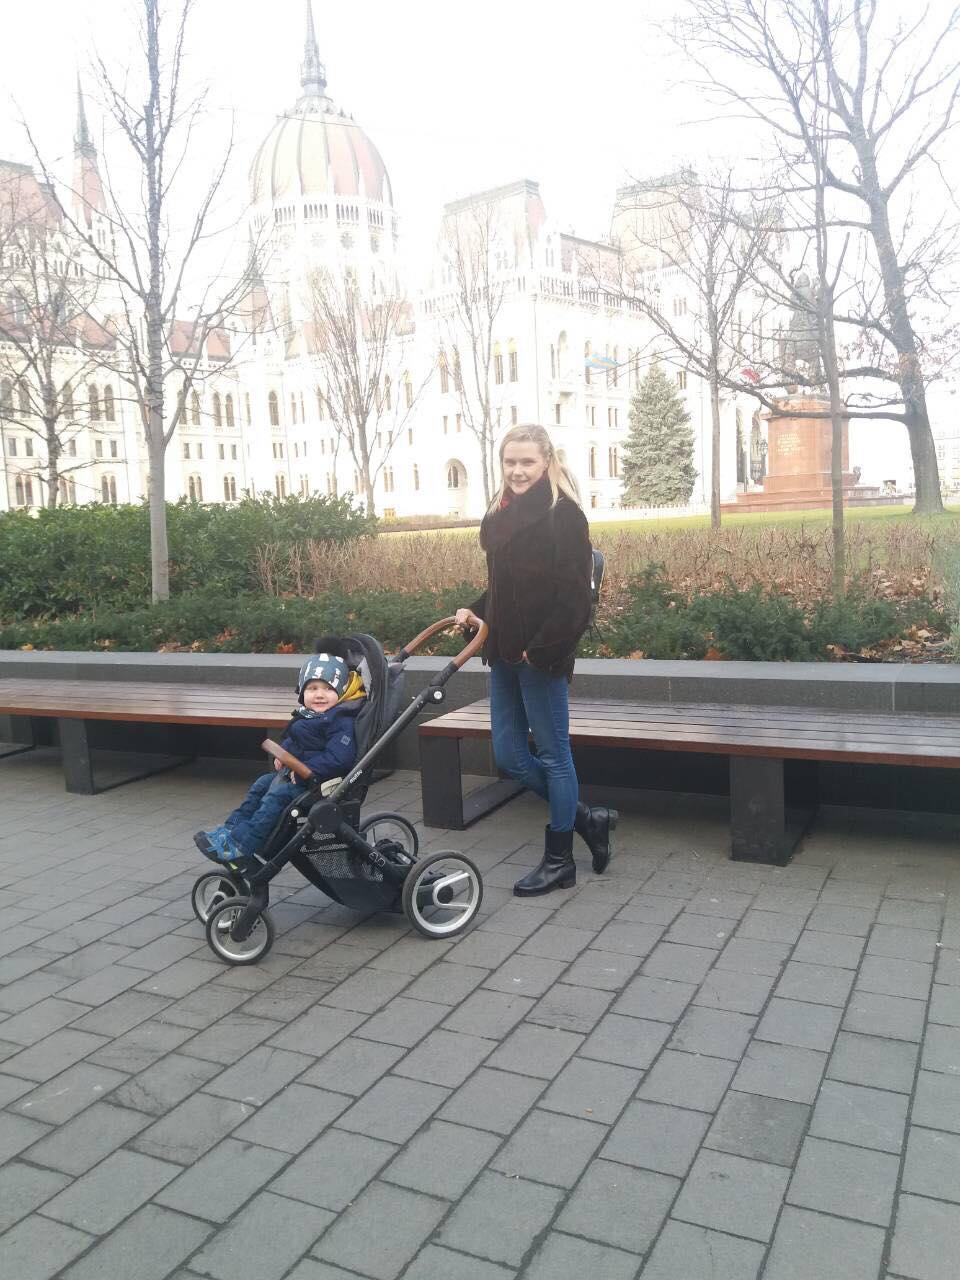 Европа с детьми: Испания, Андорра, Венгрия и Австрия